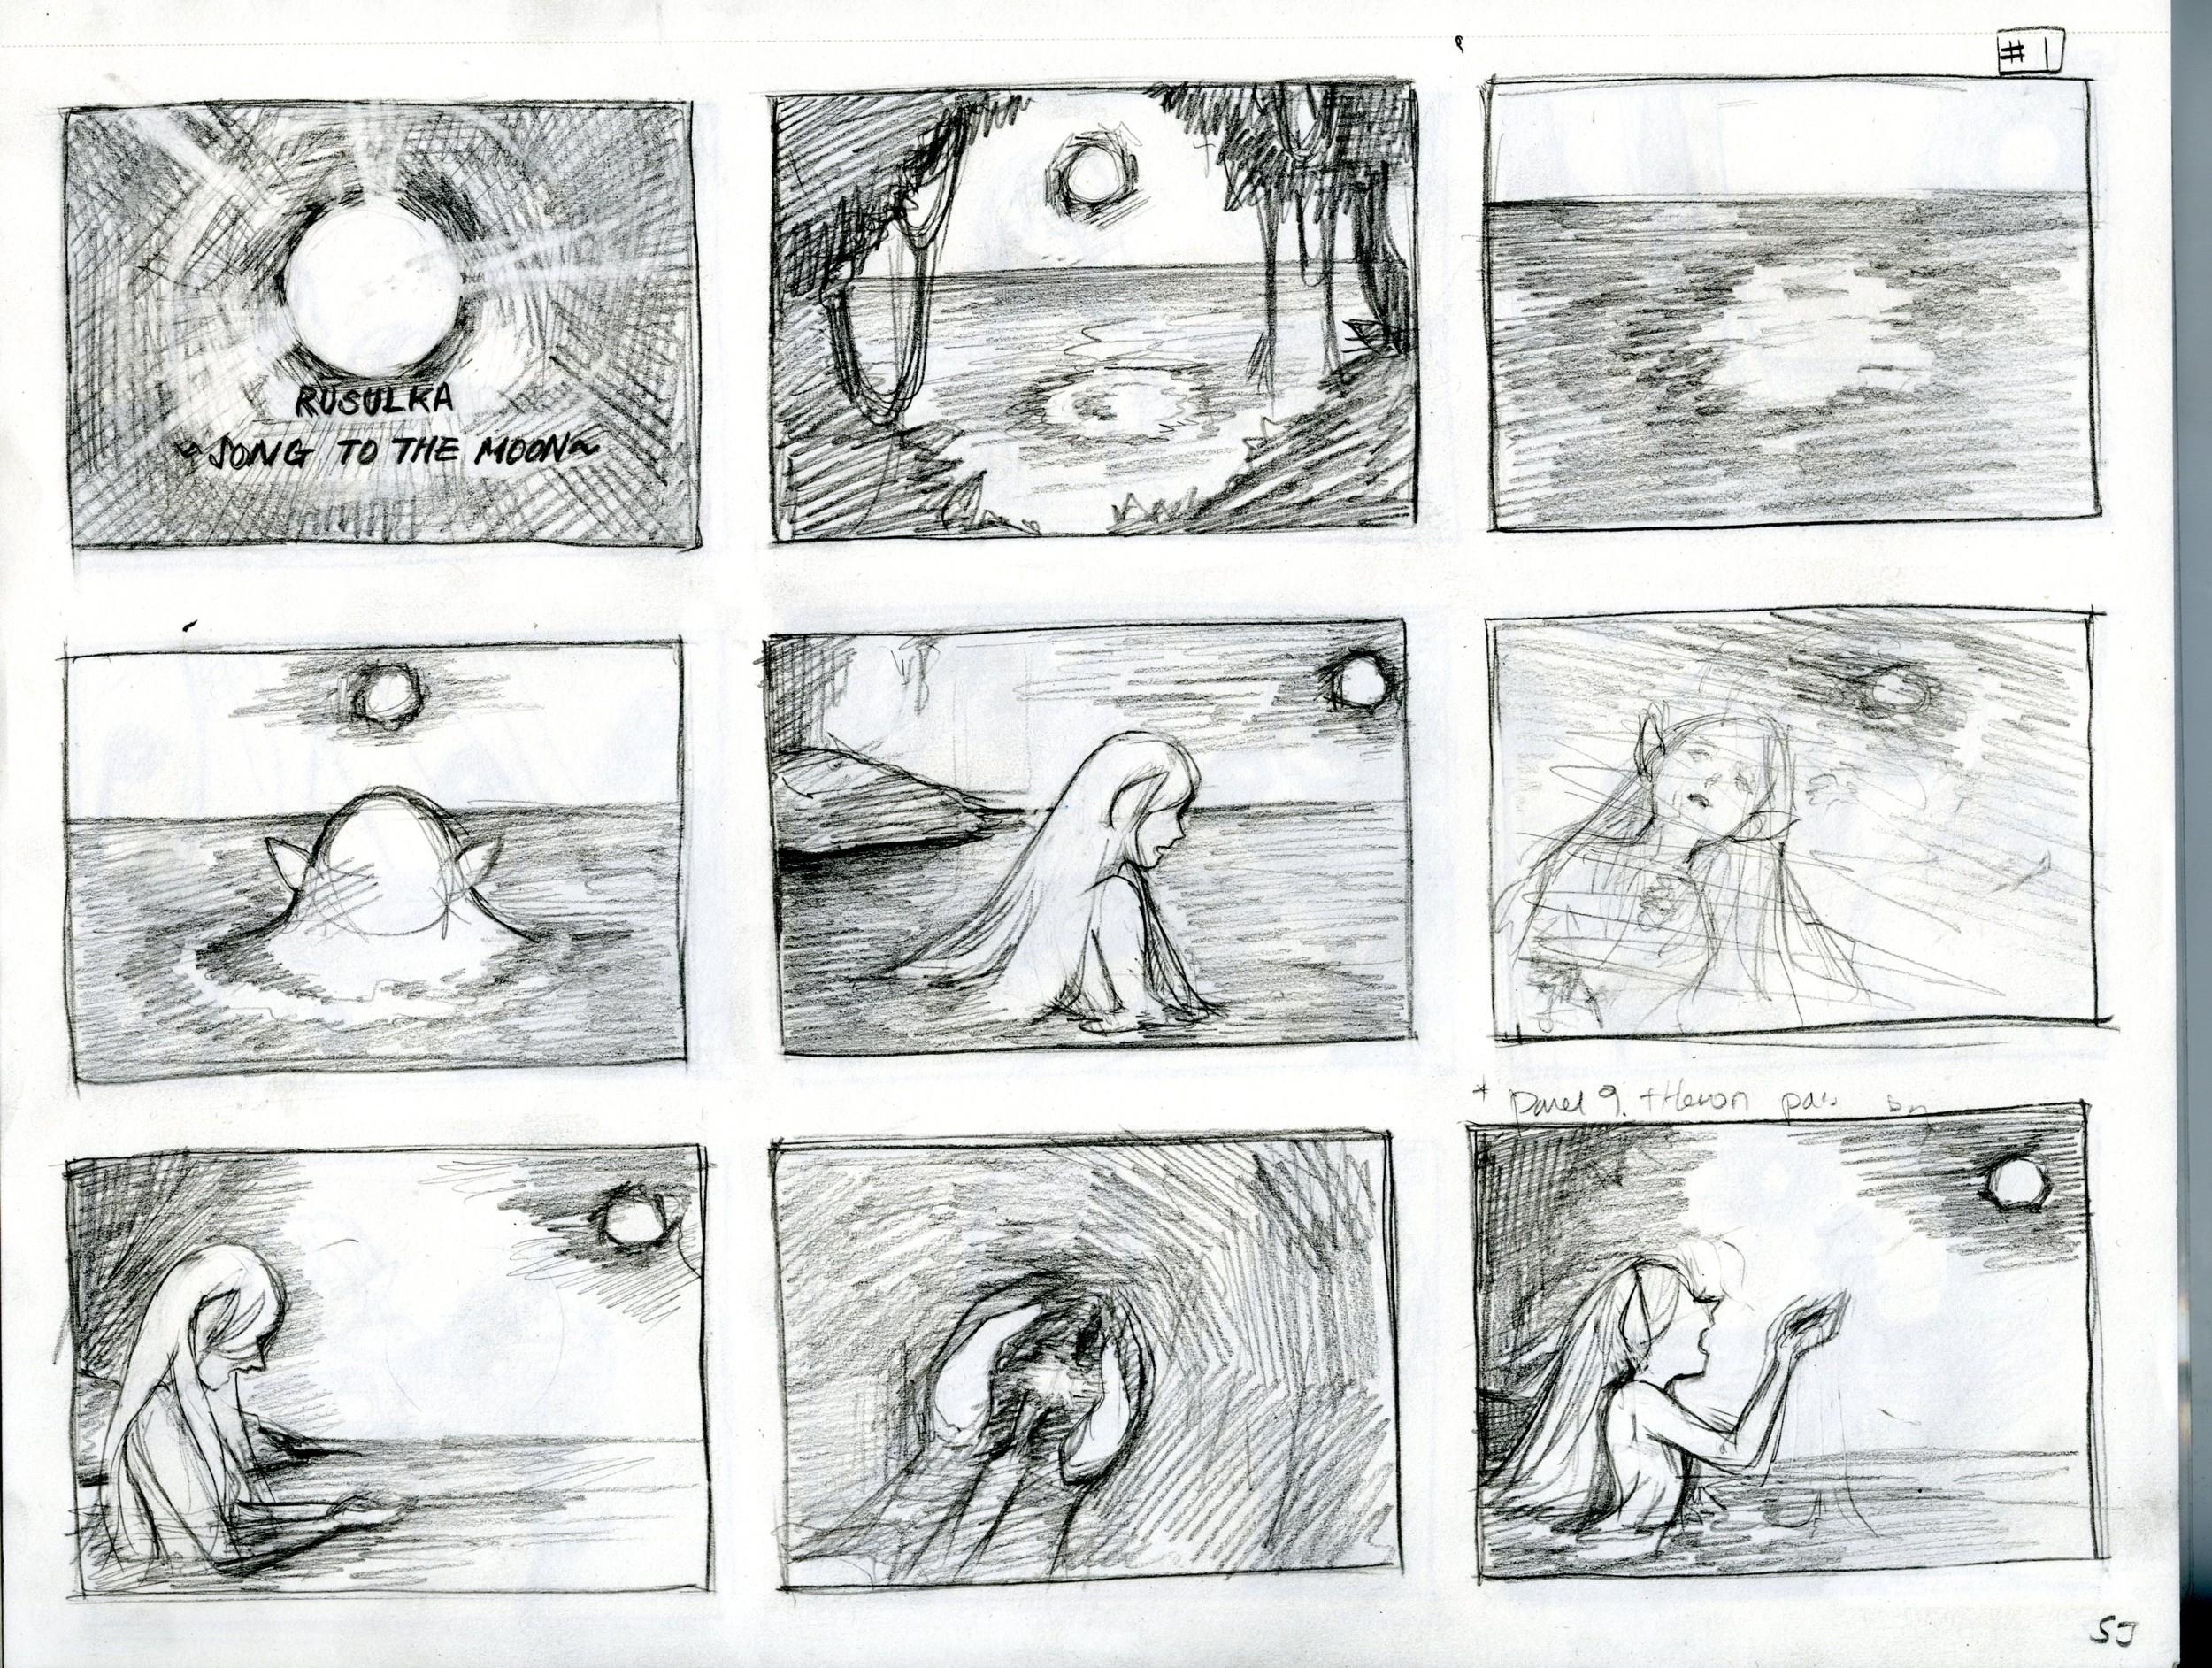 Soojin's Storyboard